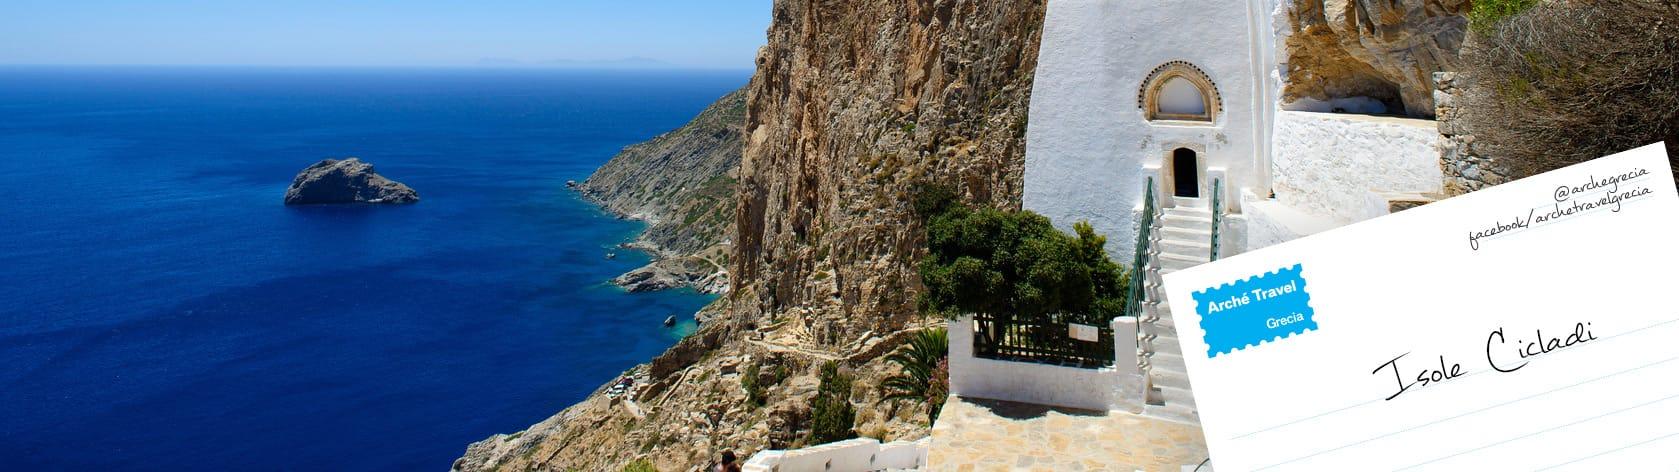 CATALOGHI Viaggi Isole Cicladi Tour Isole Cicladi - Arché Travel - Tour Operator Isole Cicladi Grecia